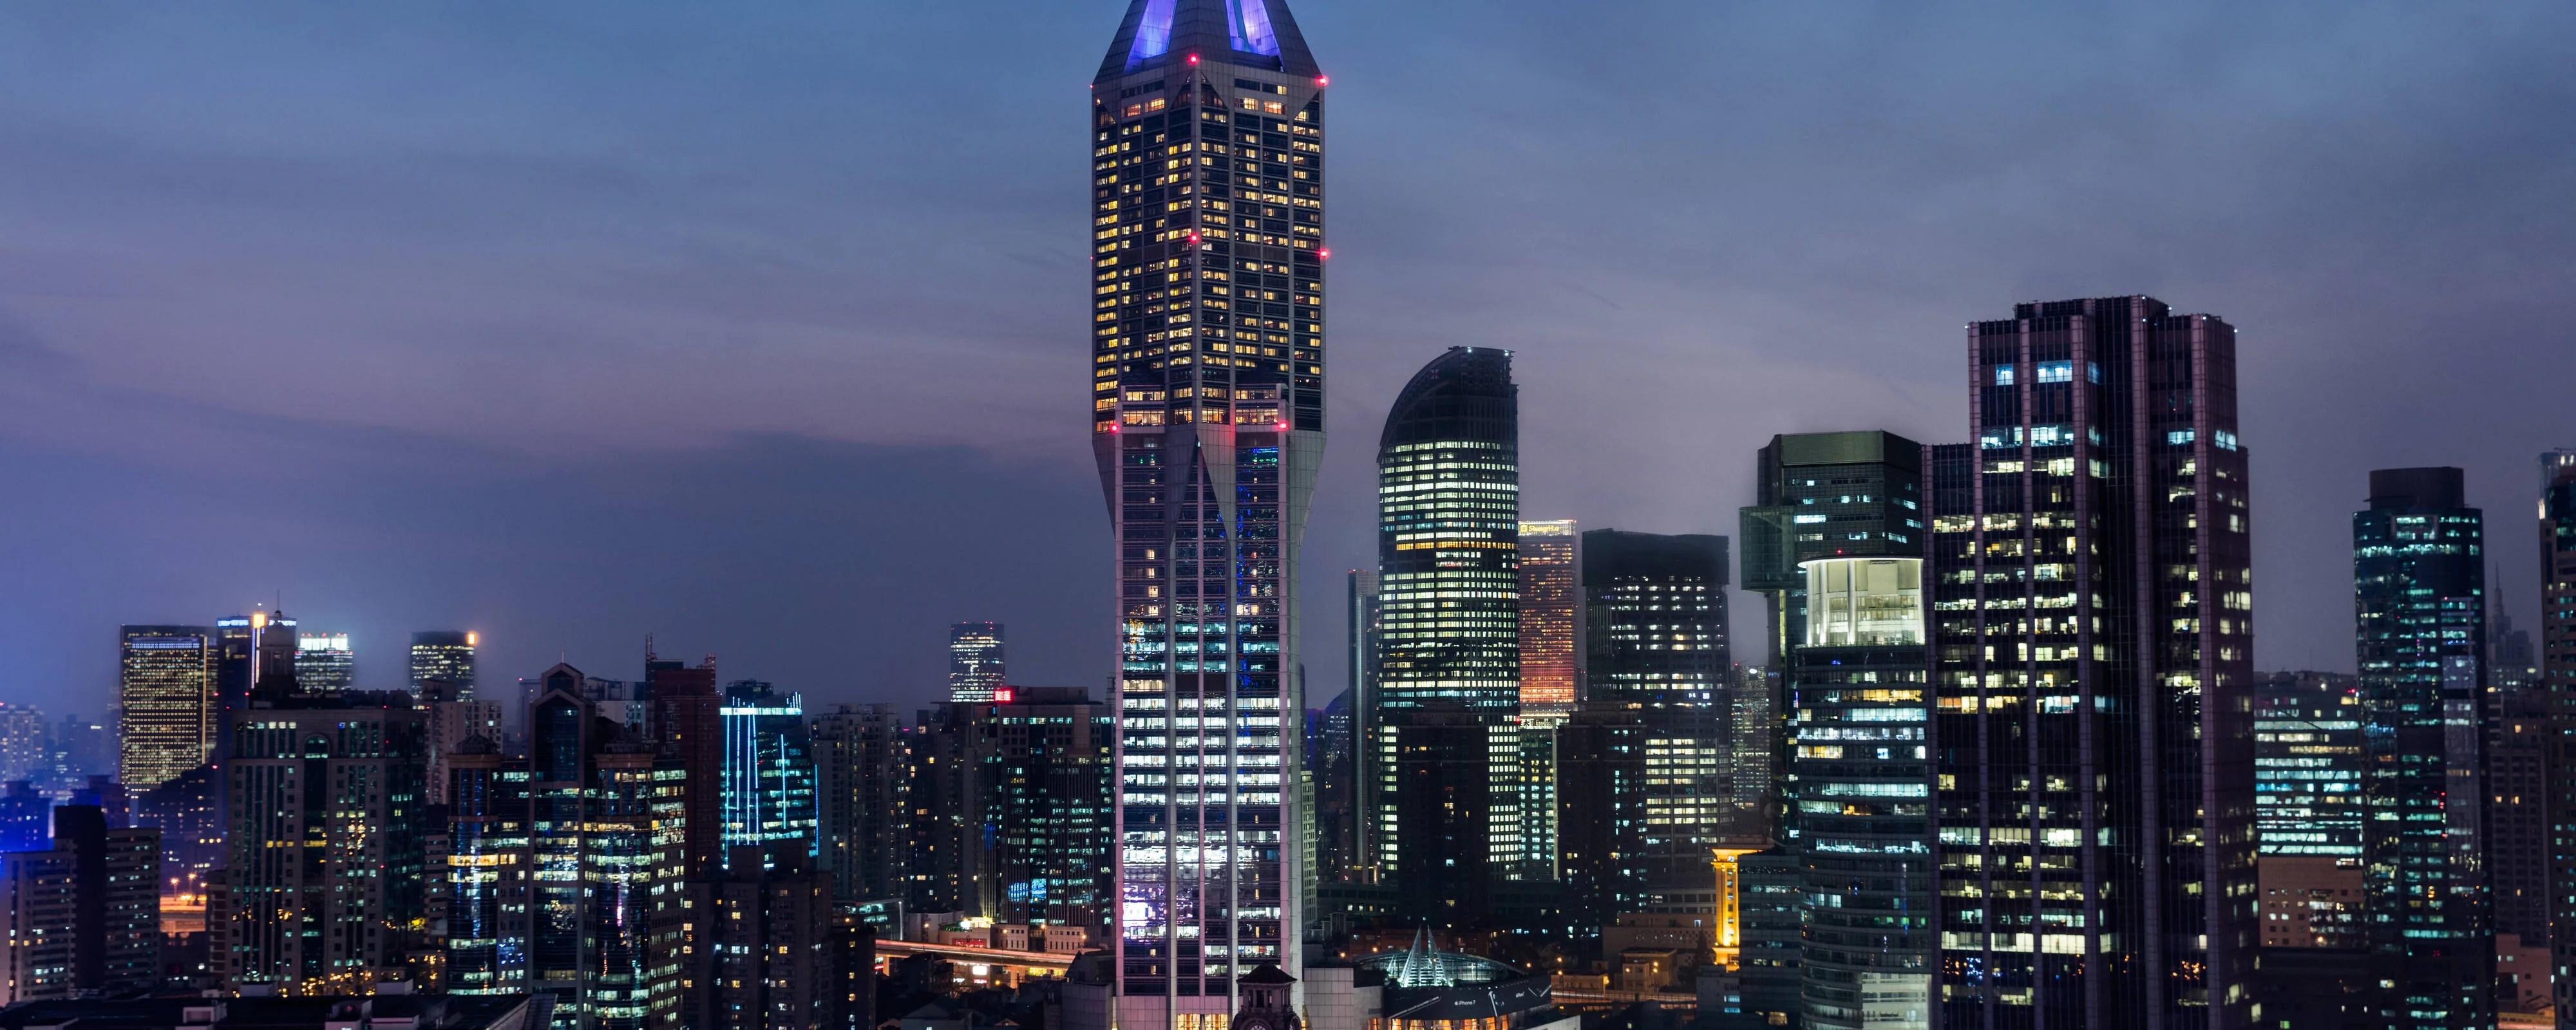 Downtown Shanghai Hotel Jw Marriott Hotel Shanghai At